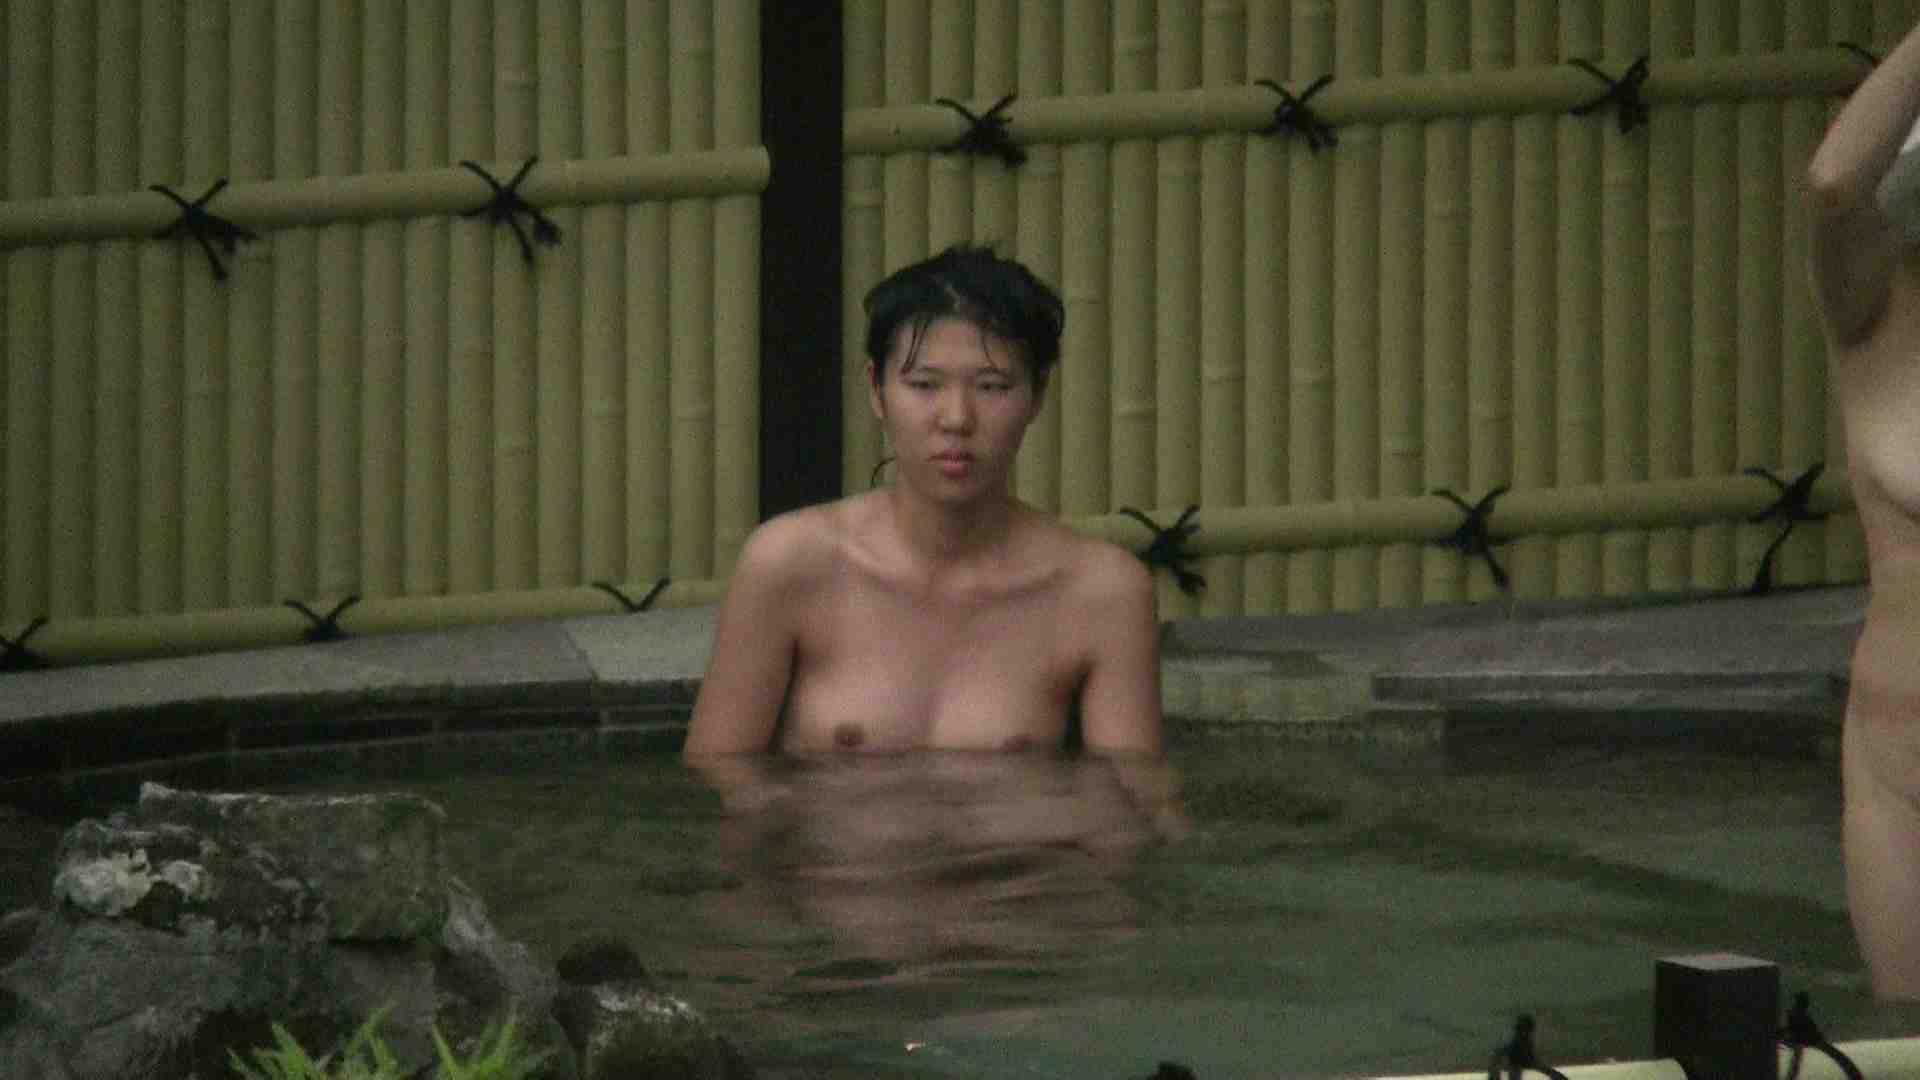 Aquaな露天風呂Vol.215 盗撮 おまんこ無修正動画無料 106枚 71